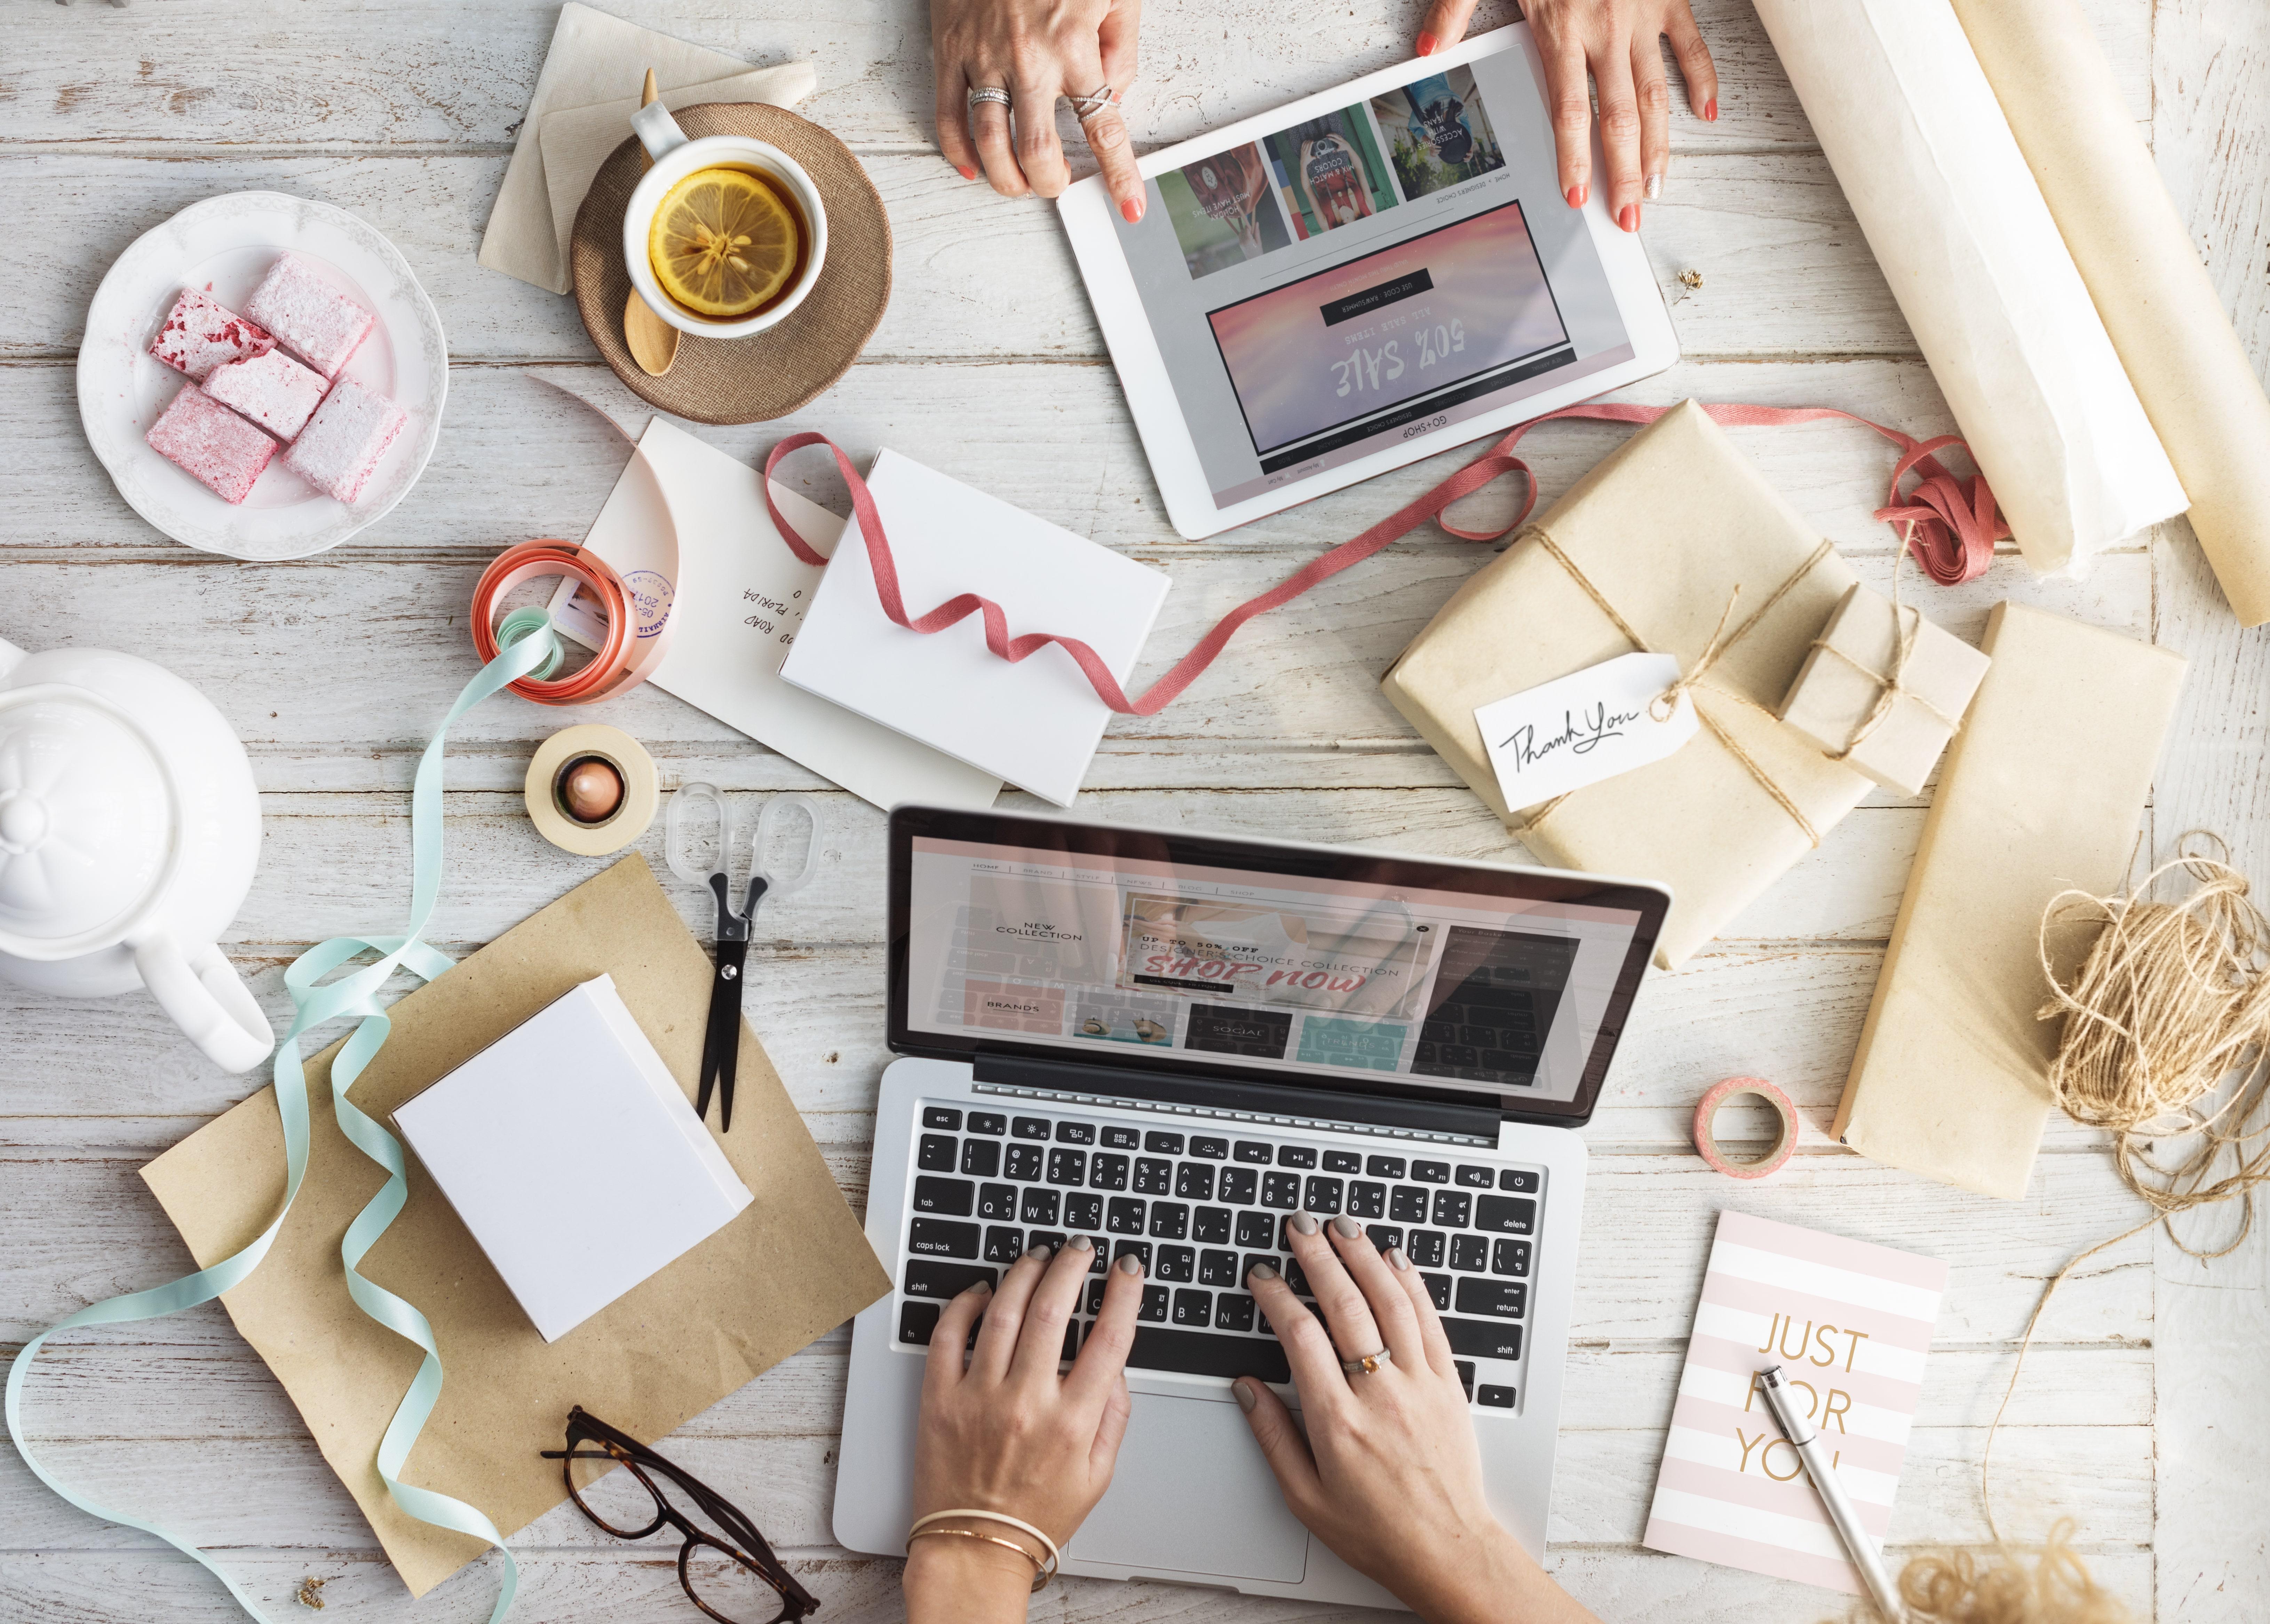 6 Ways to Market Yourself Campus News